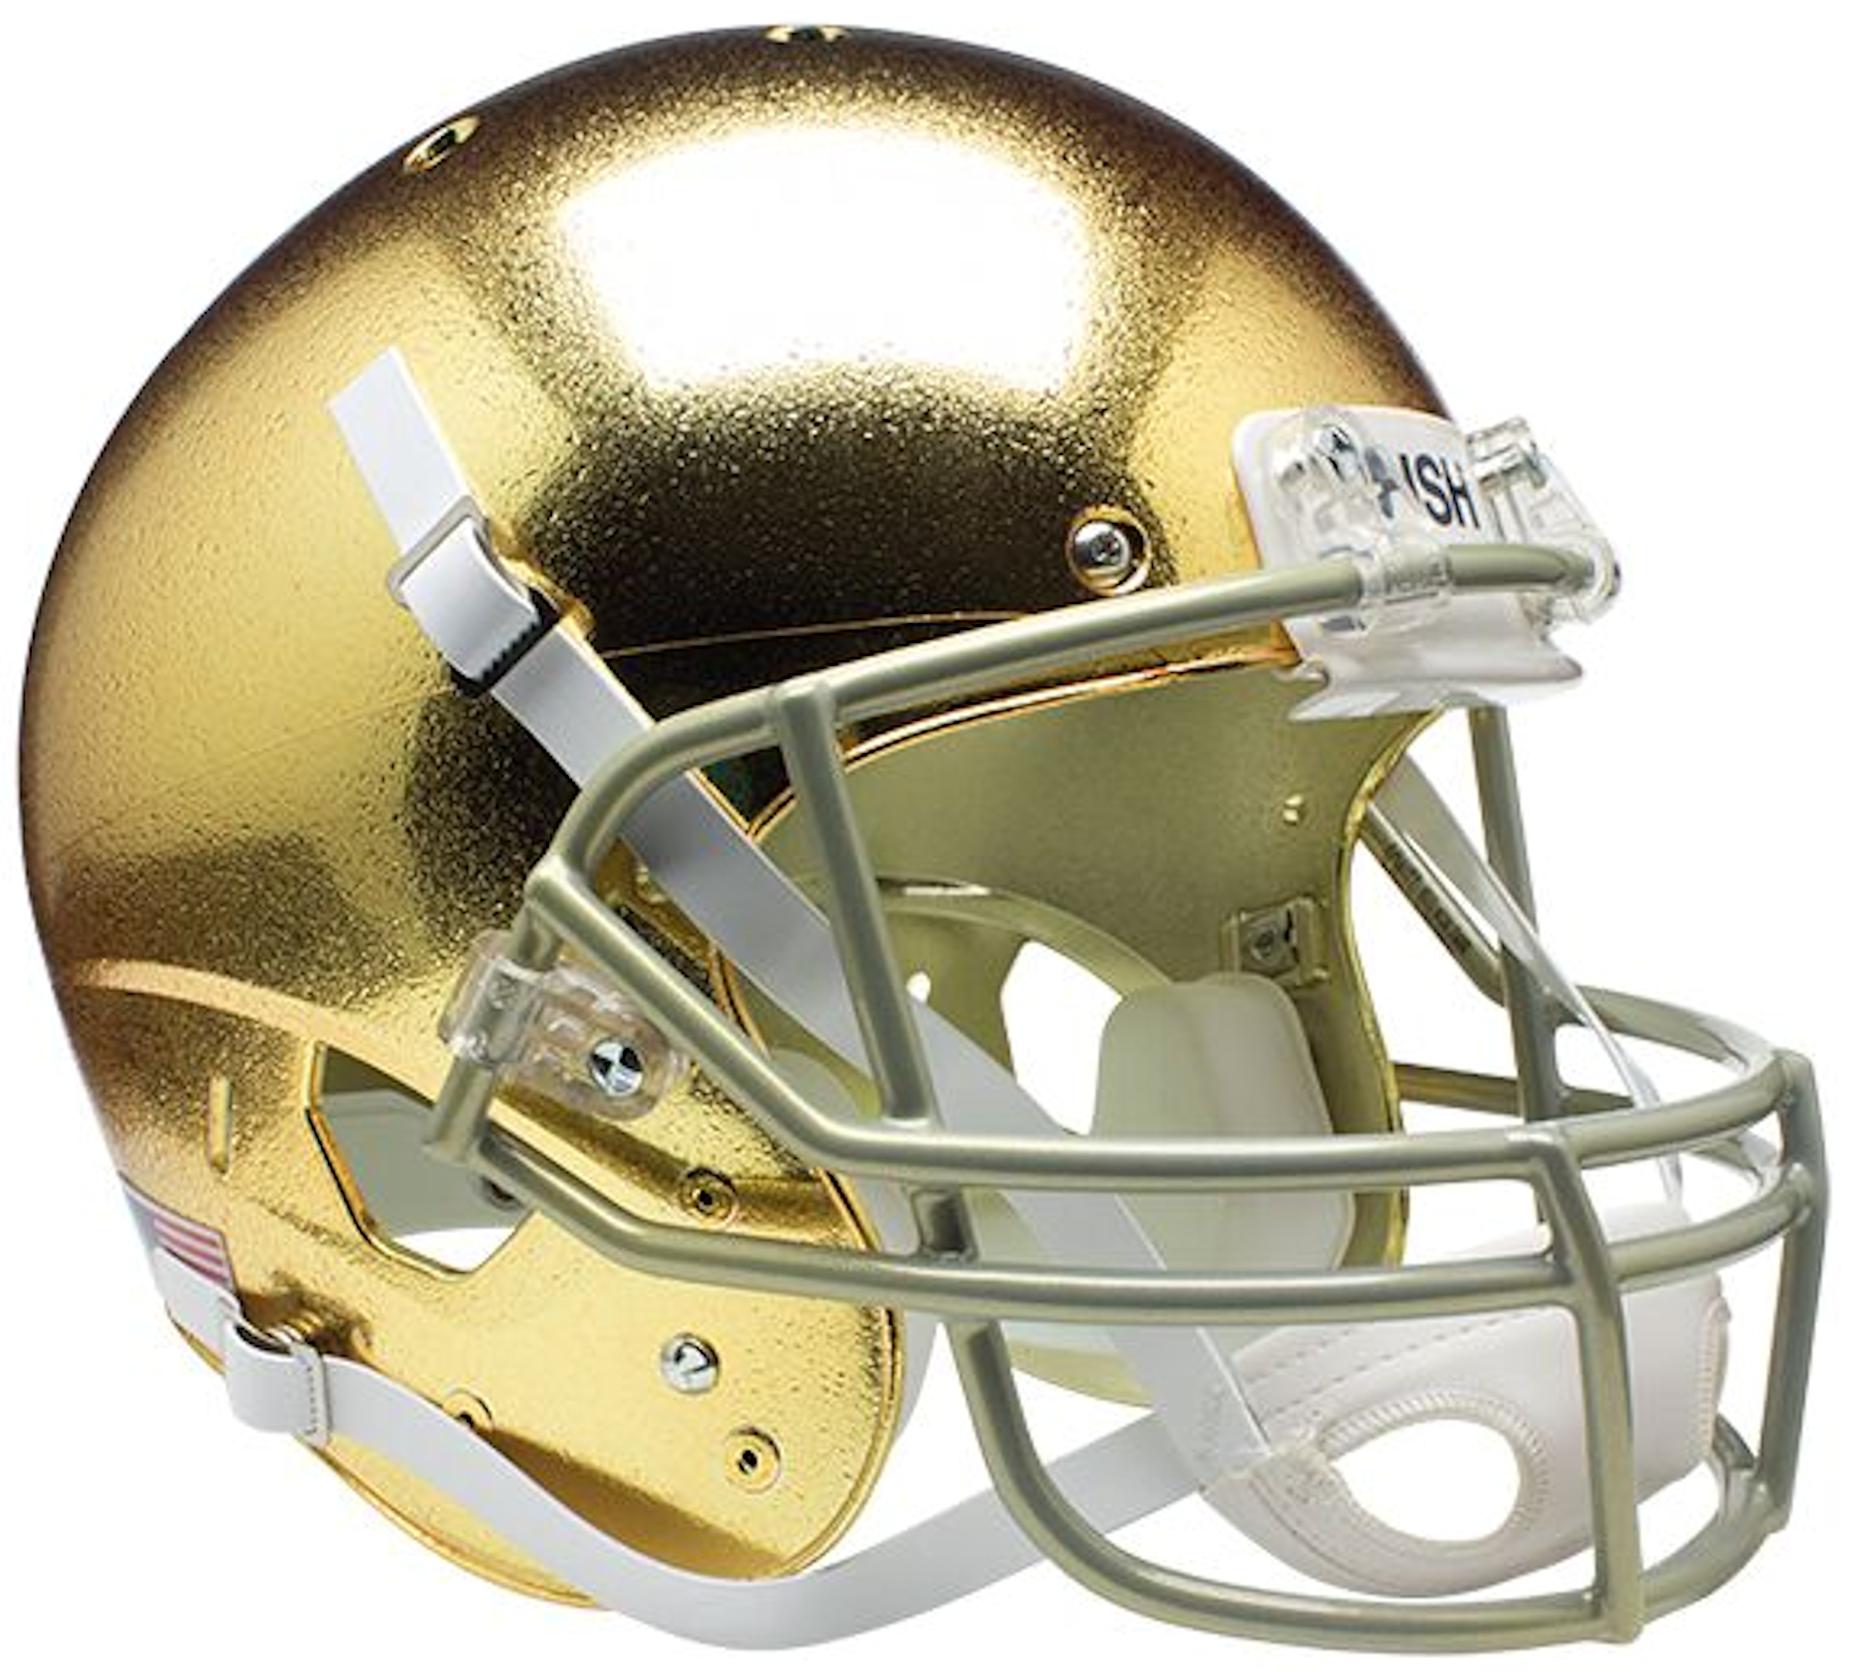 Notre Dame Fighting Irish Full XP Replica Football Helmet Schutt <B>Textured with Metallic Mask</B>